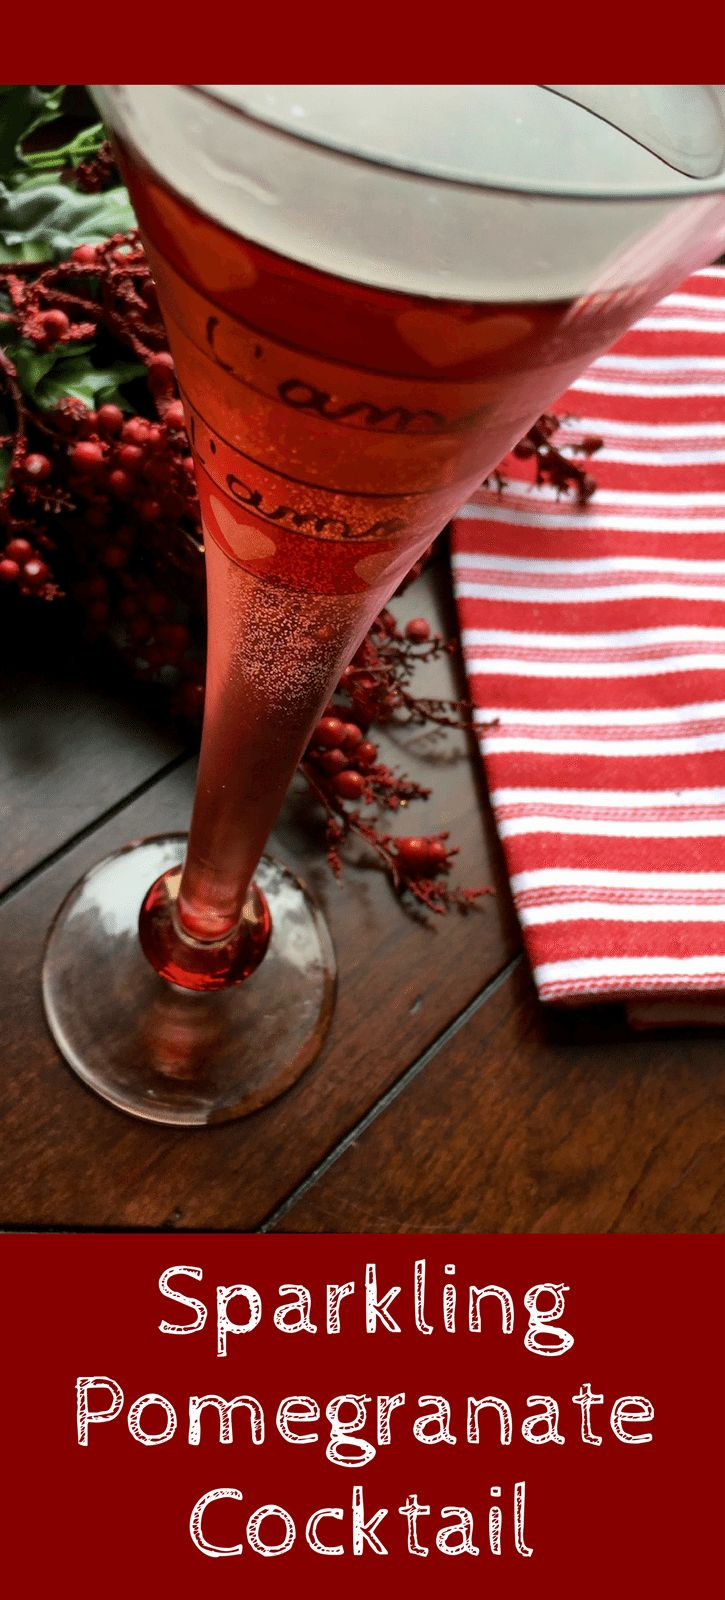 Sparkling Pomegranate Cocktail | Recipe